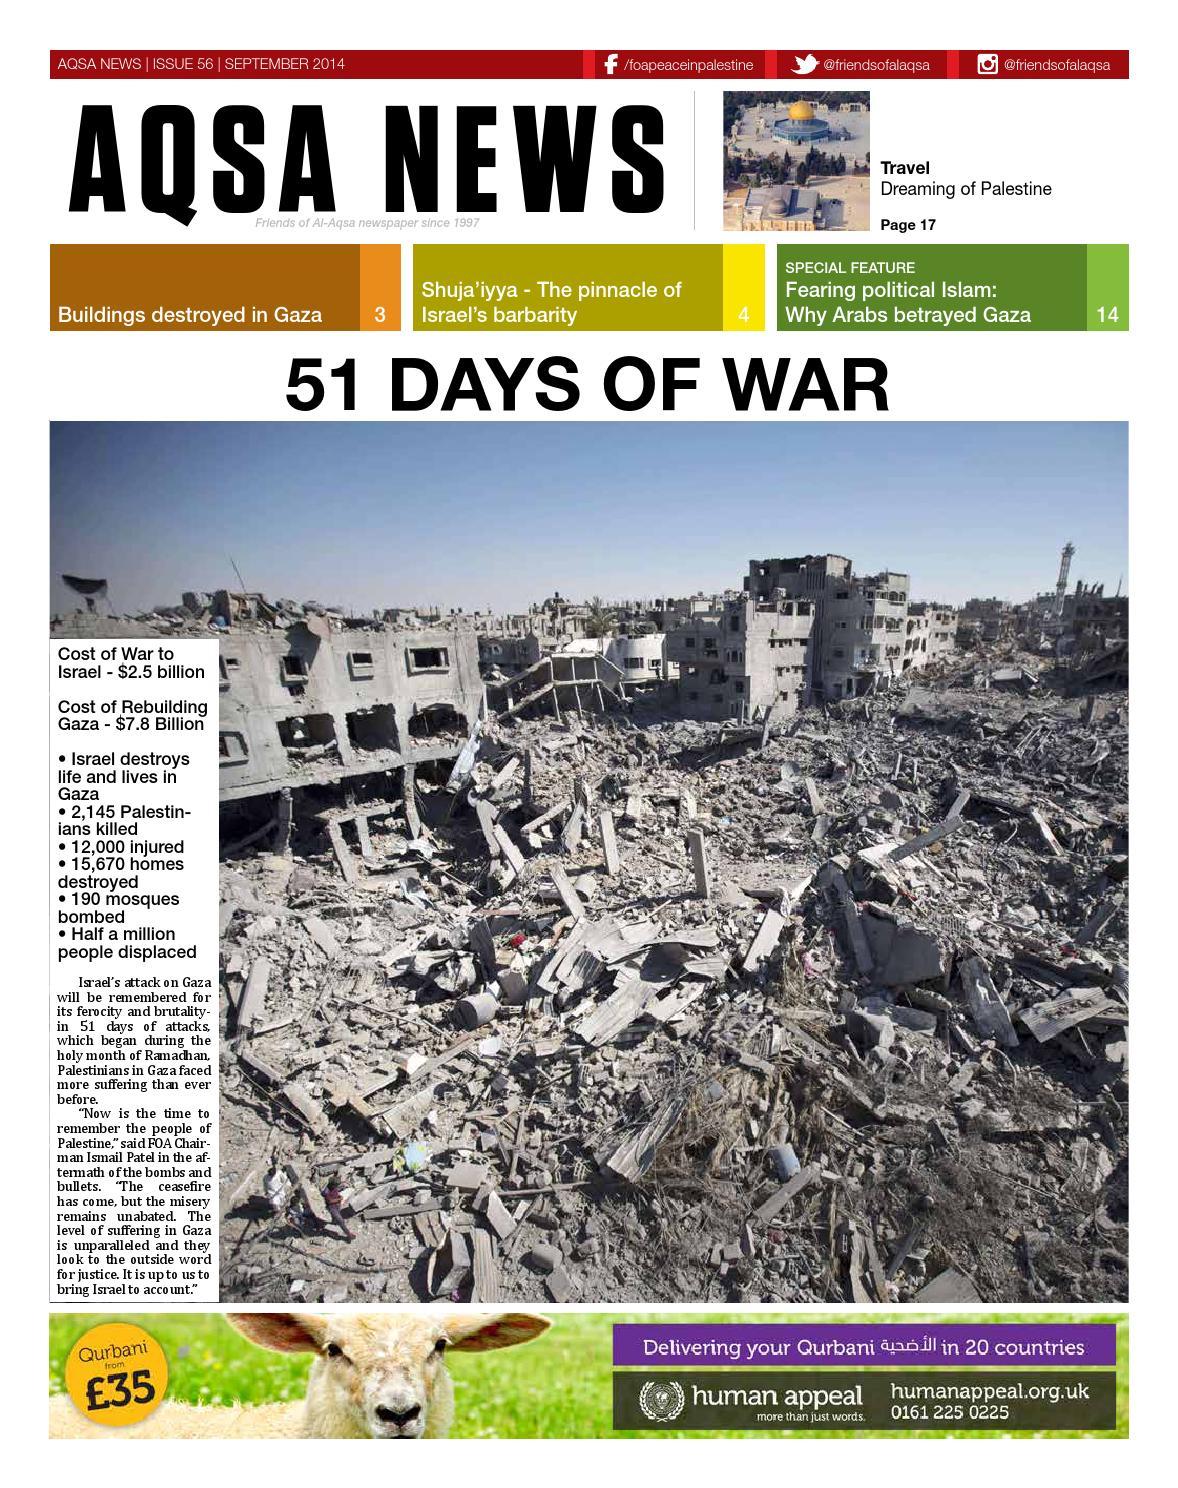 Aqsa News, Issue 56, September 2014 by Friends of Al Aqsa